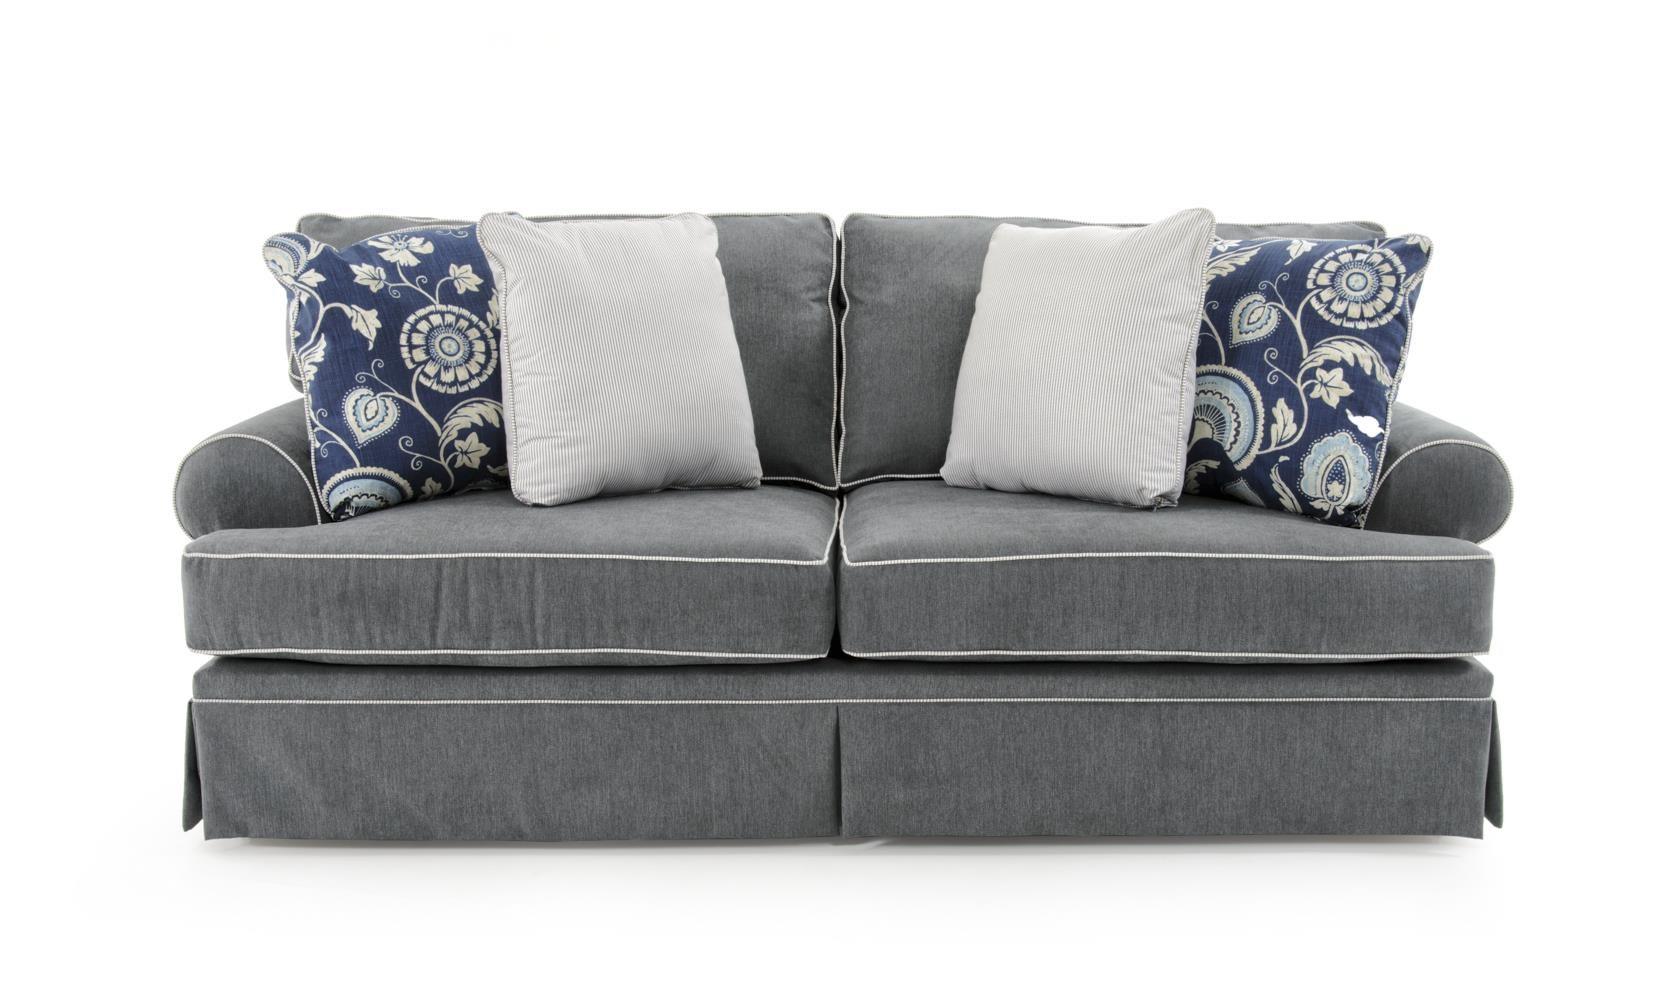 Broyhill Furniture Emily Queen Goodnight Sleeper Sofa   Baeru0027s Furniture    Sleeper Sofas